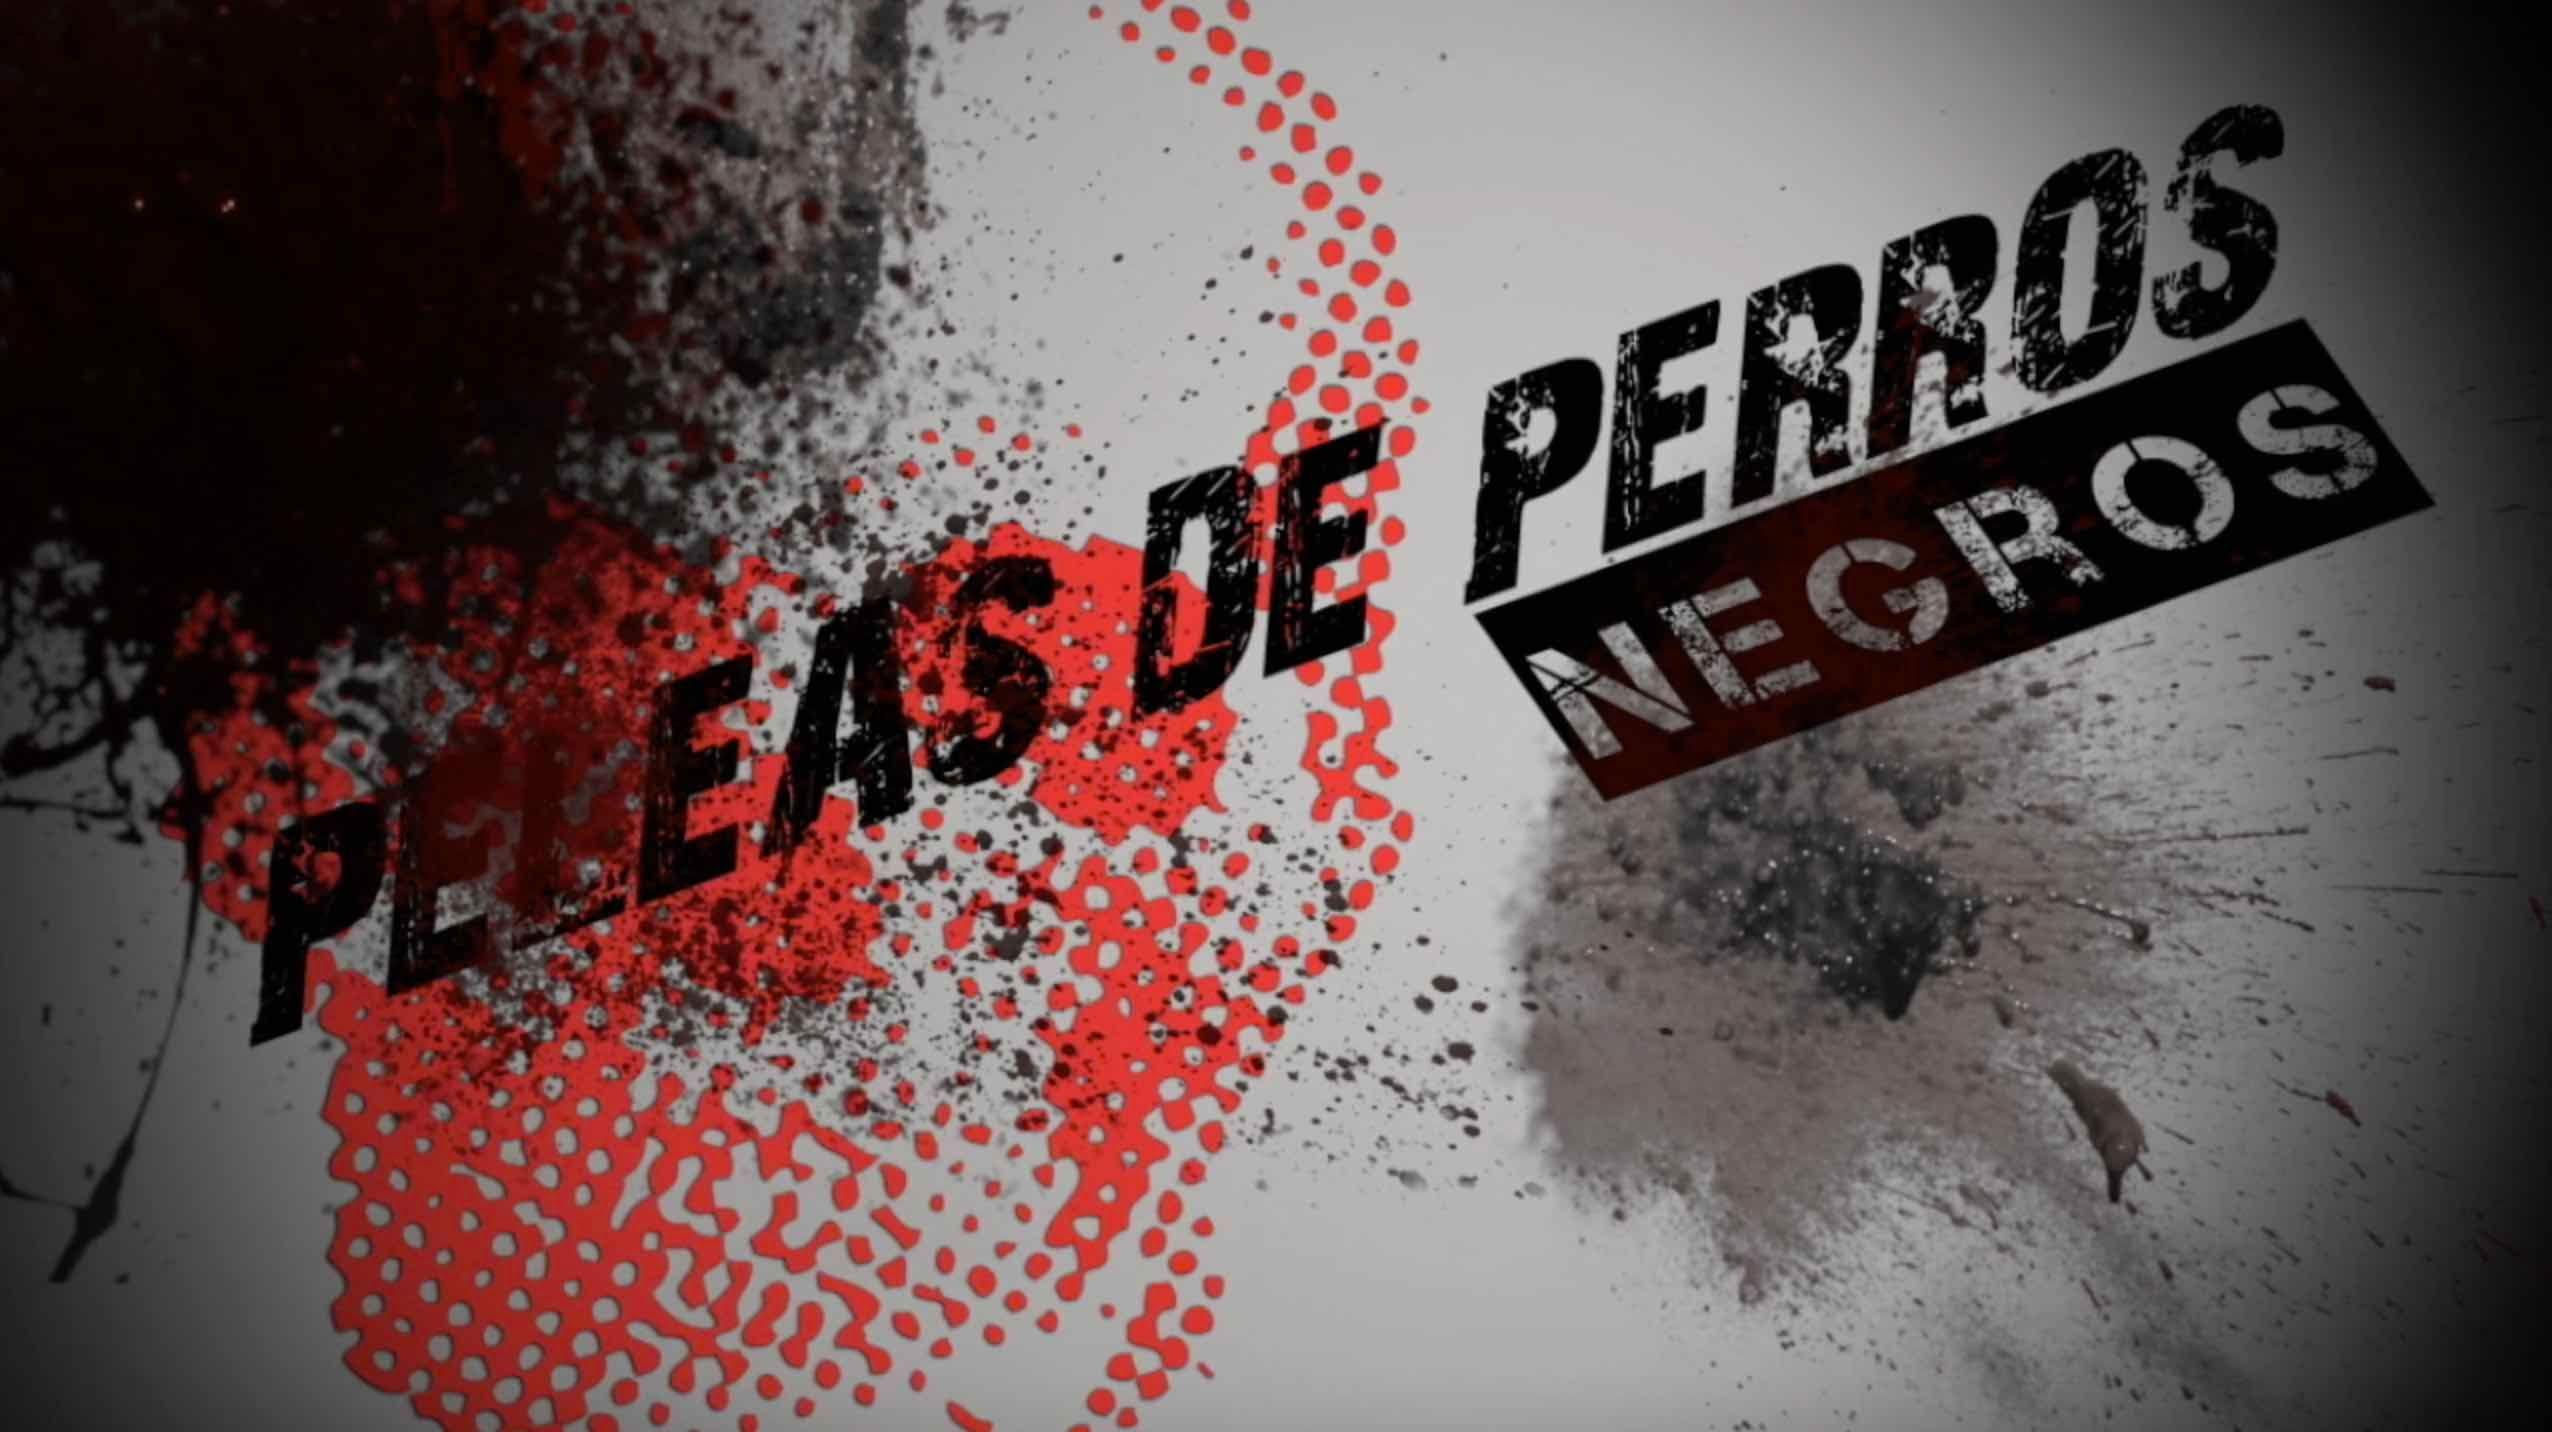 PERRO NEGRO PRESENTA: #DIASDEPERROS / PELEAS DE PERROS NEGROS